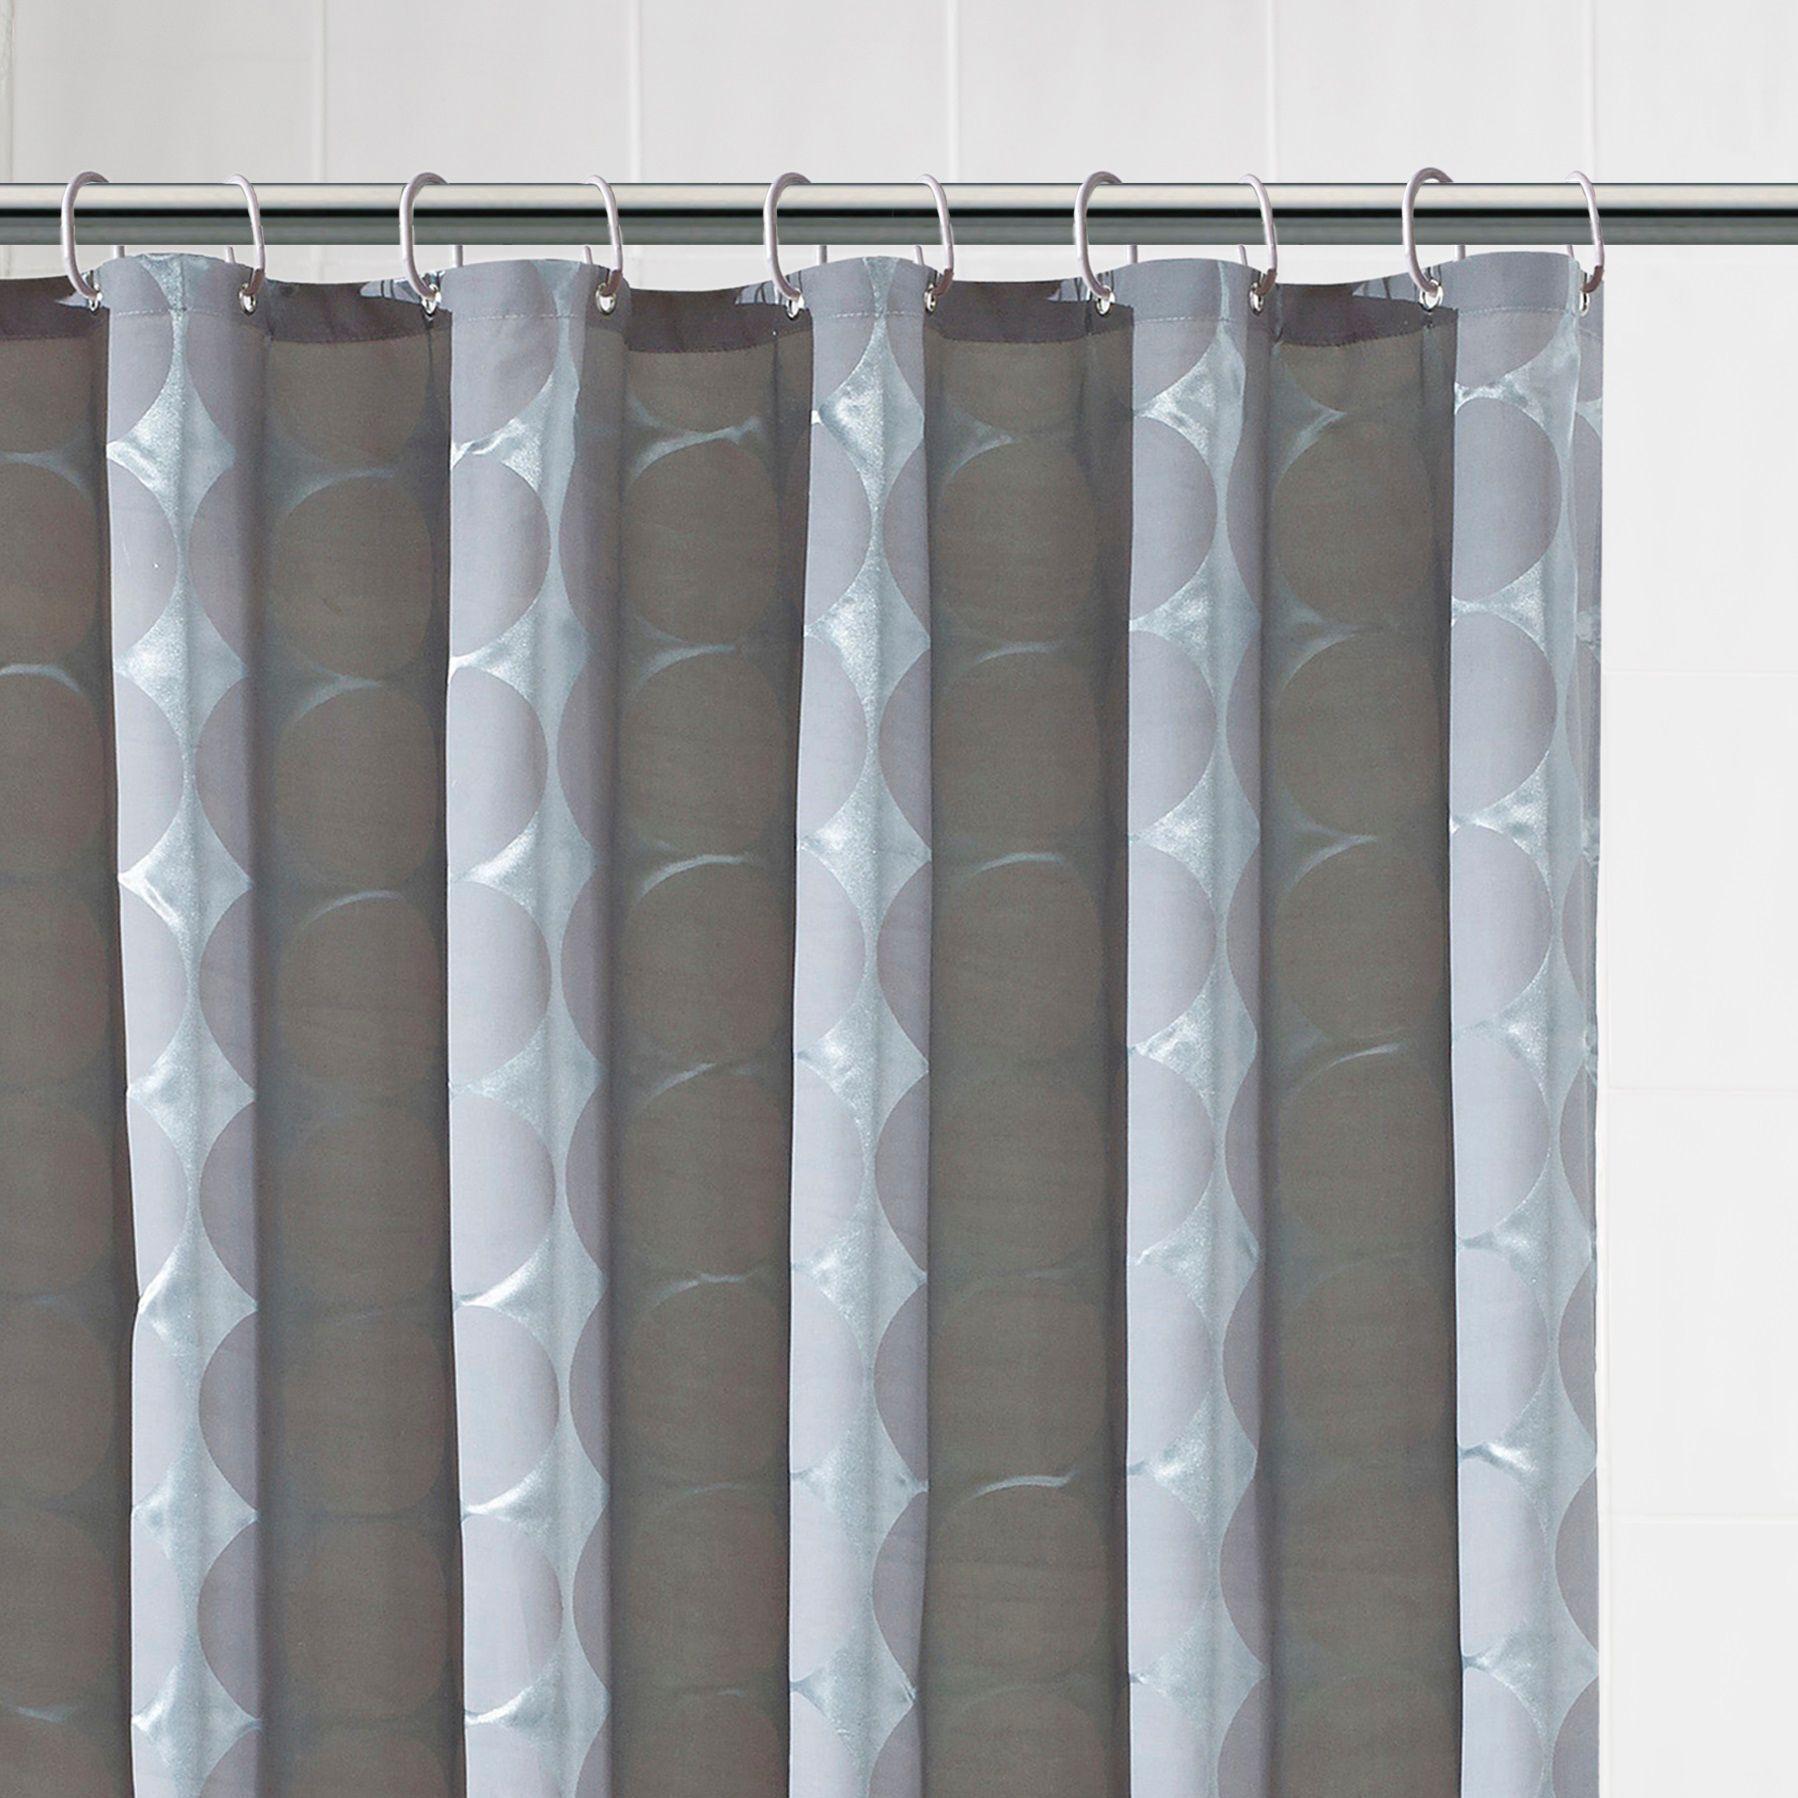 B and q pebble shower curtain curtain menzilperde net for B q bathroom accessories